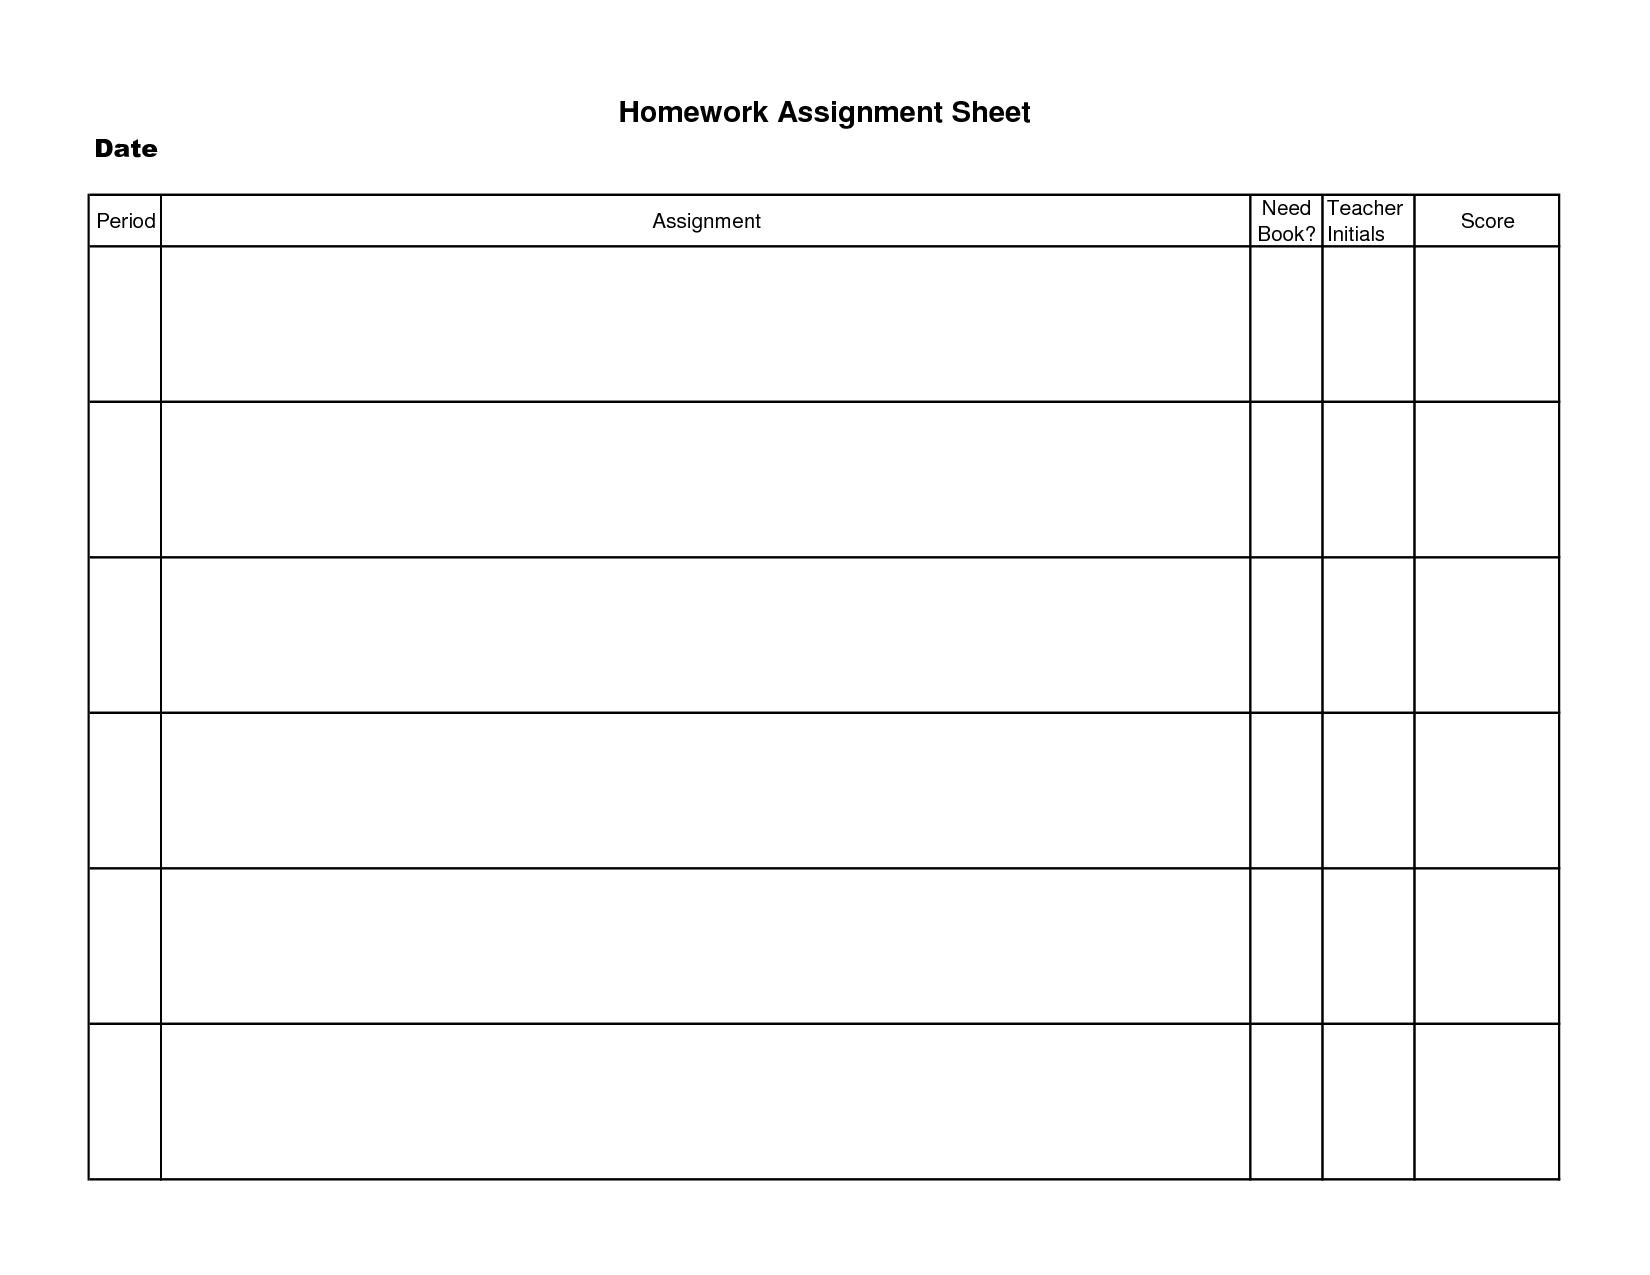 Printable Homework Assignment Sheet Template   Decrease Depression - Free Printable Homework Assignment Sheets